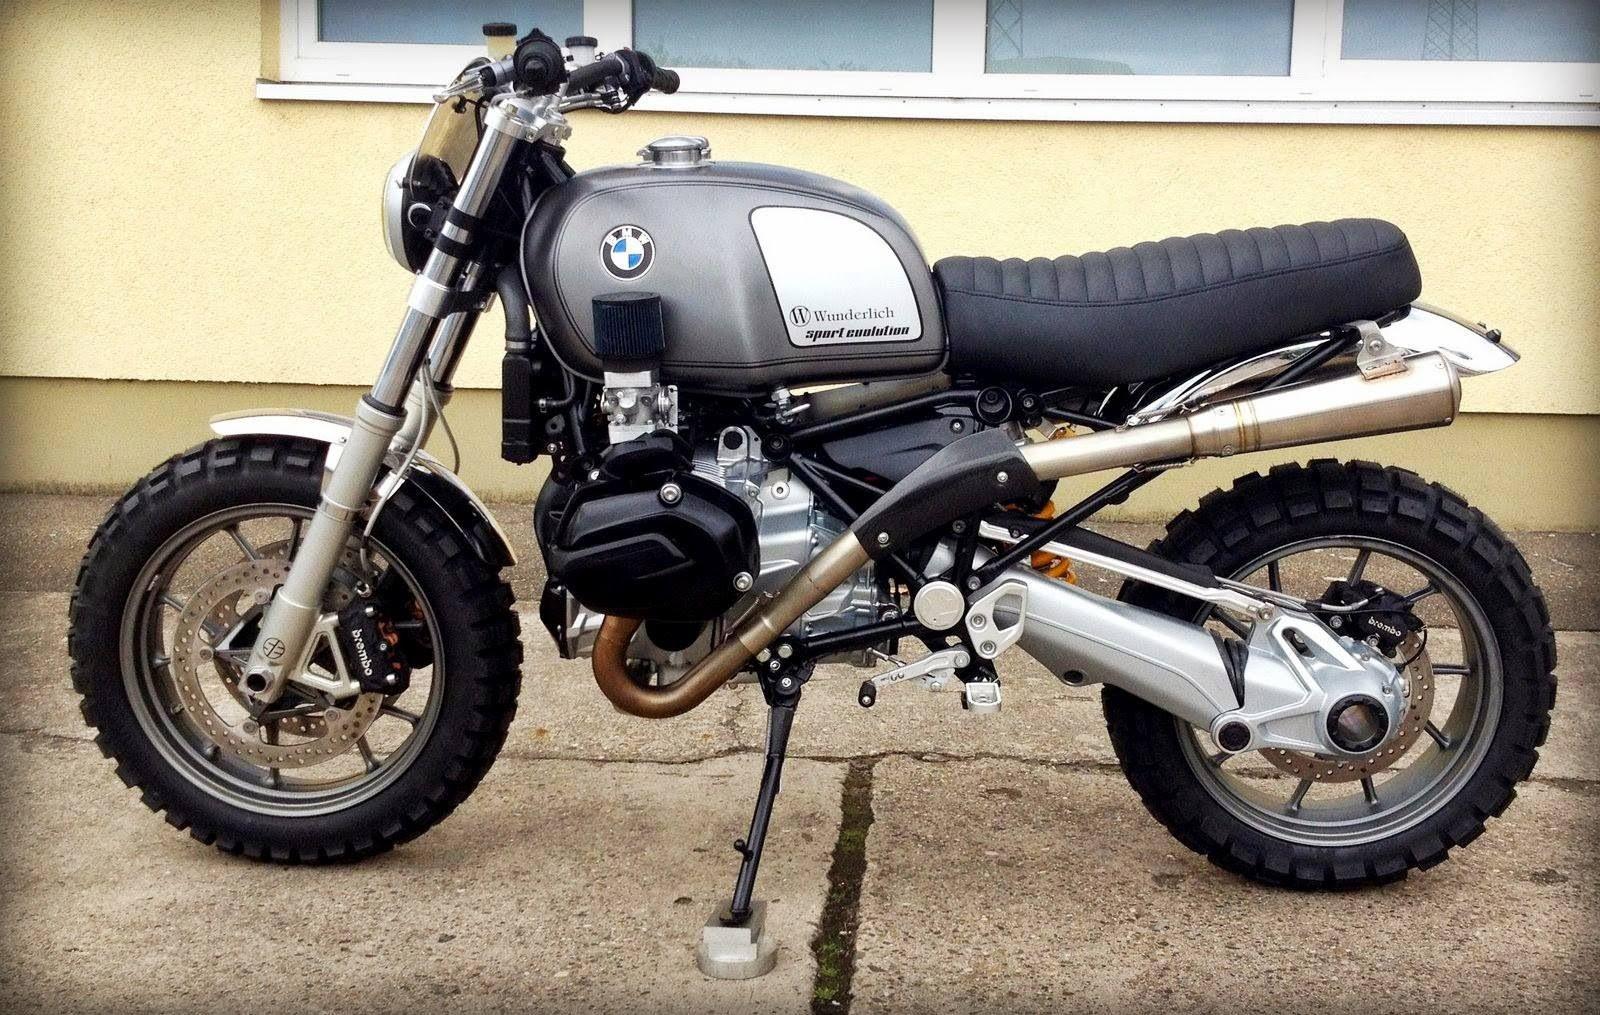 modern bmw airhead scrambler custom   motorcycles & scooters